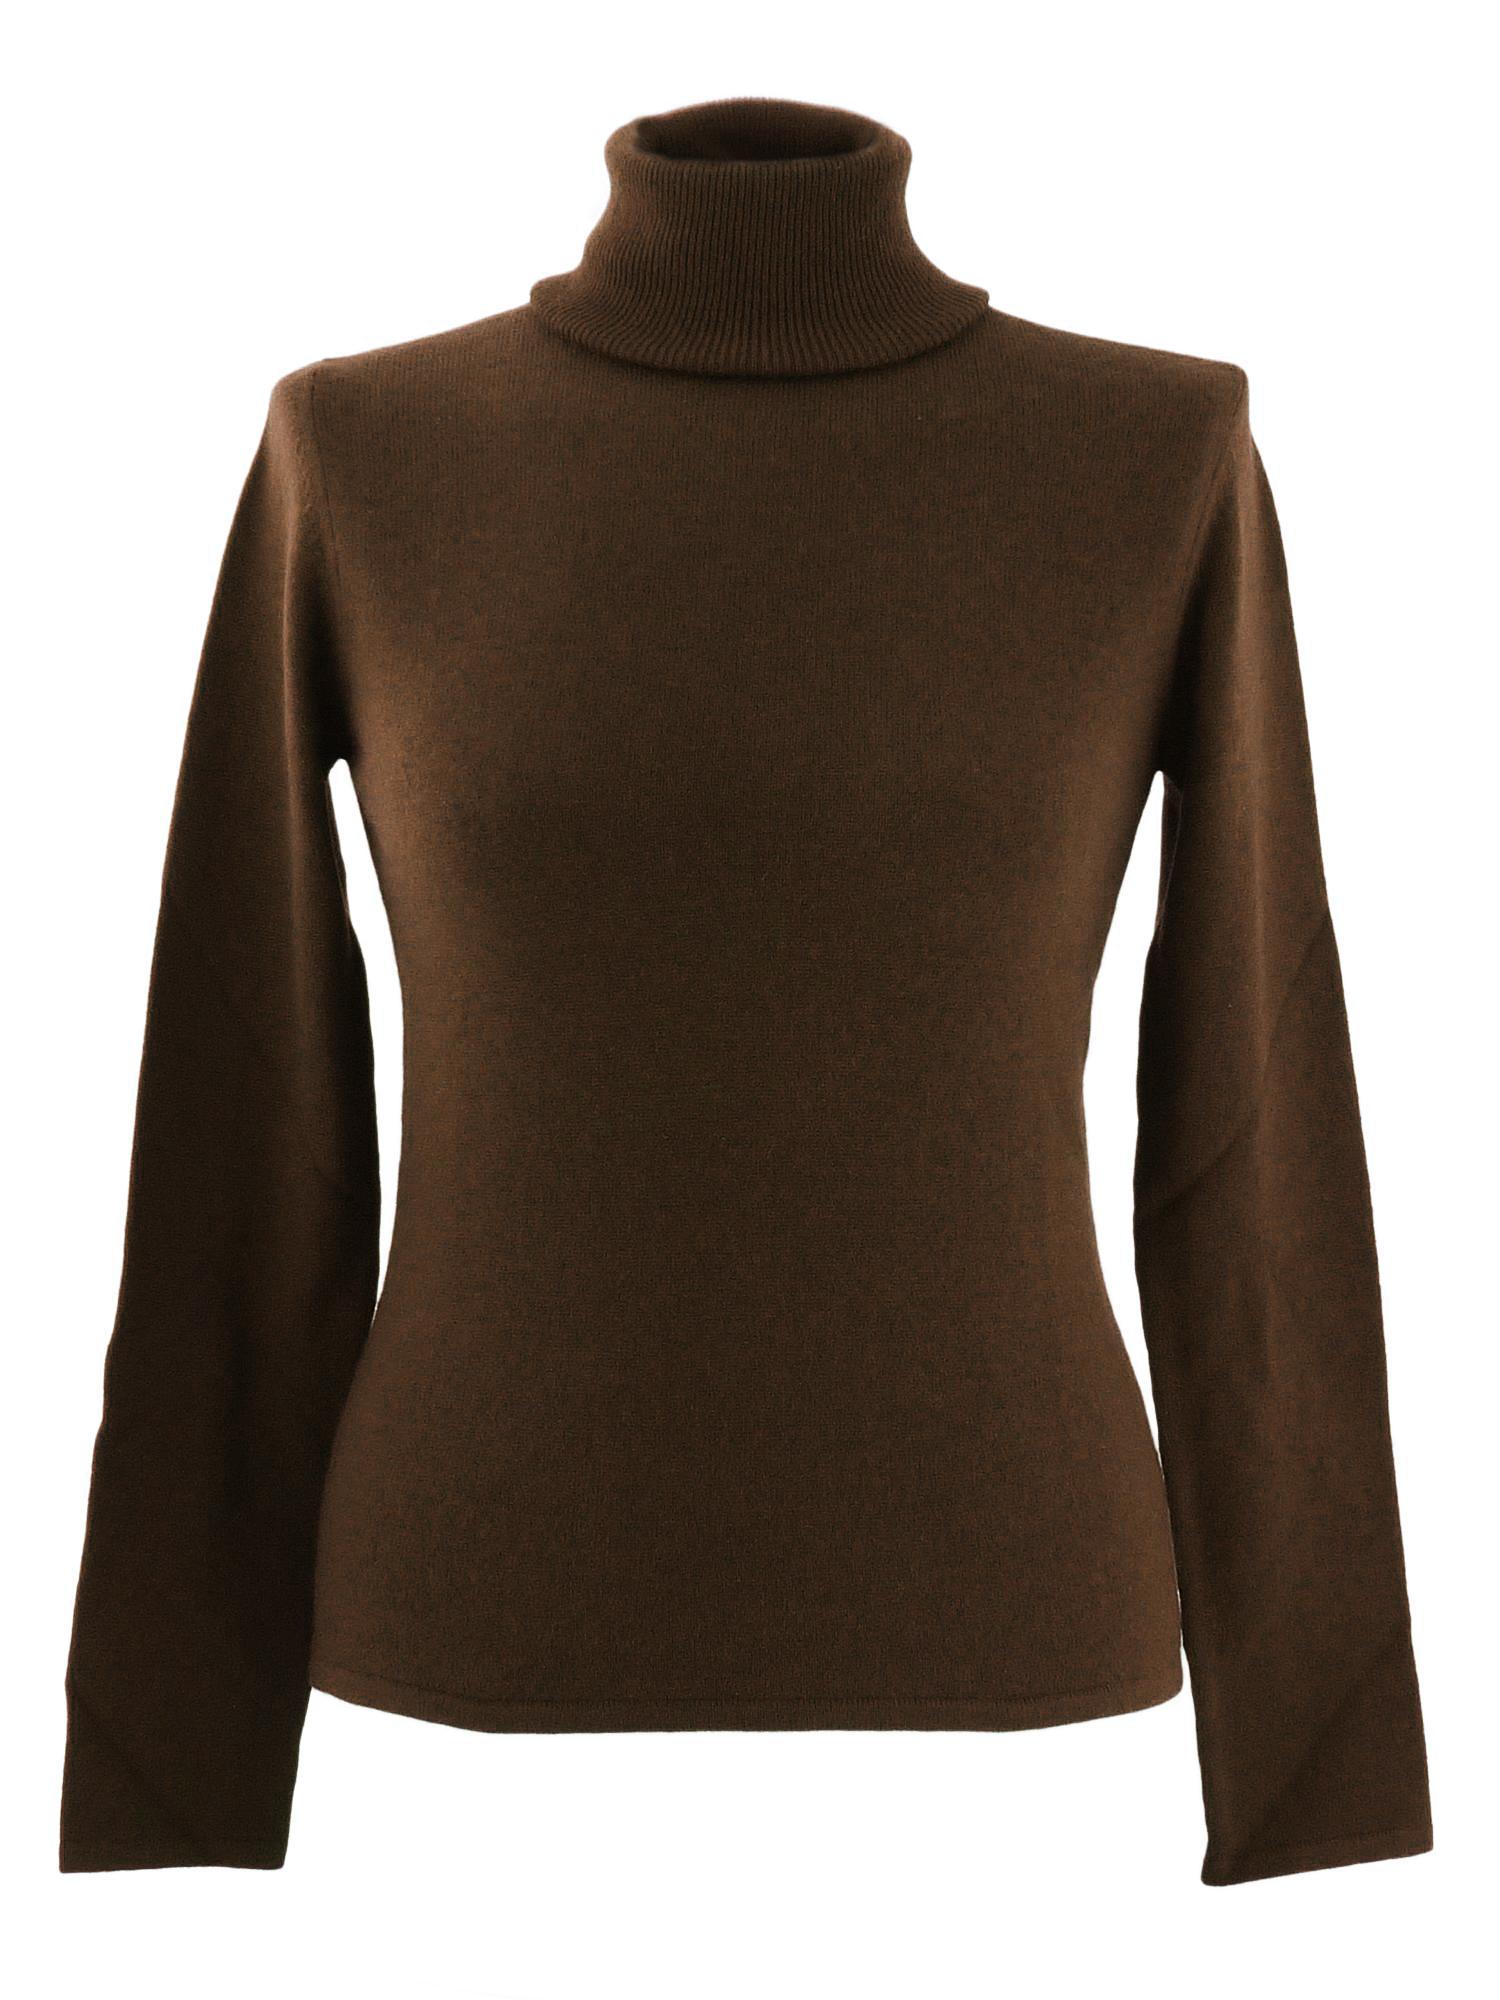 XL- Ladies - Polo Neck - Dark Chocolate